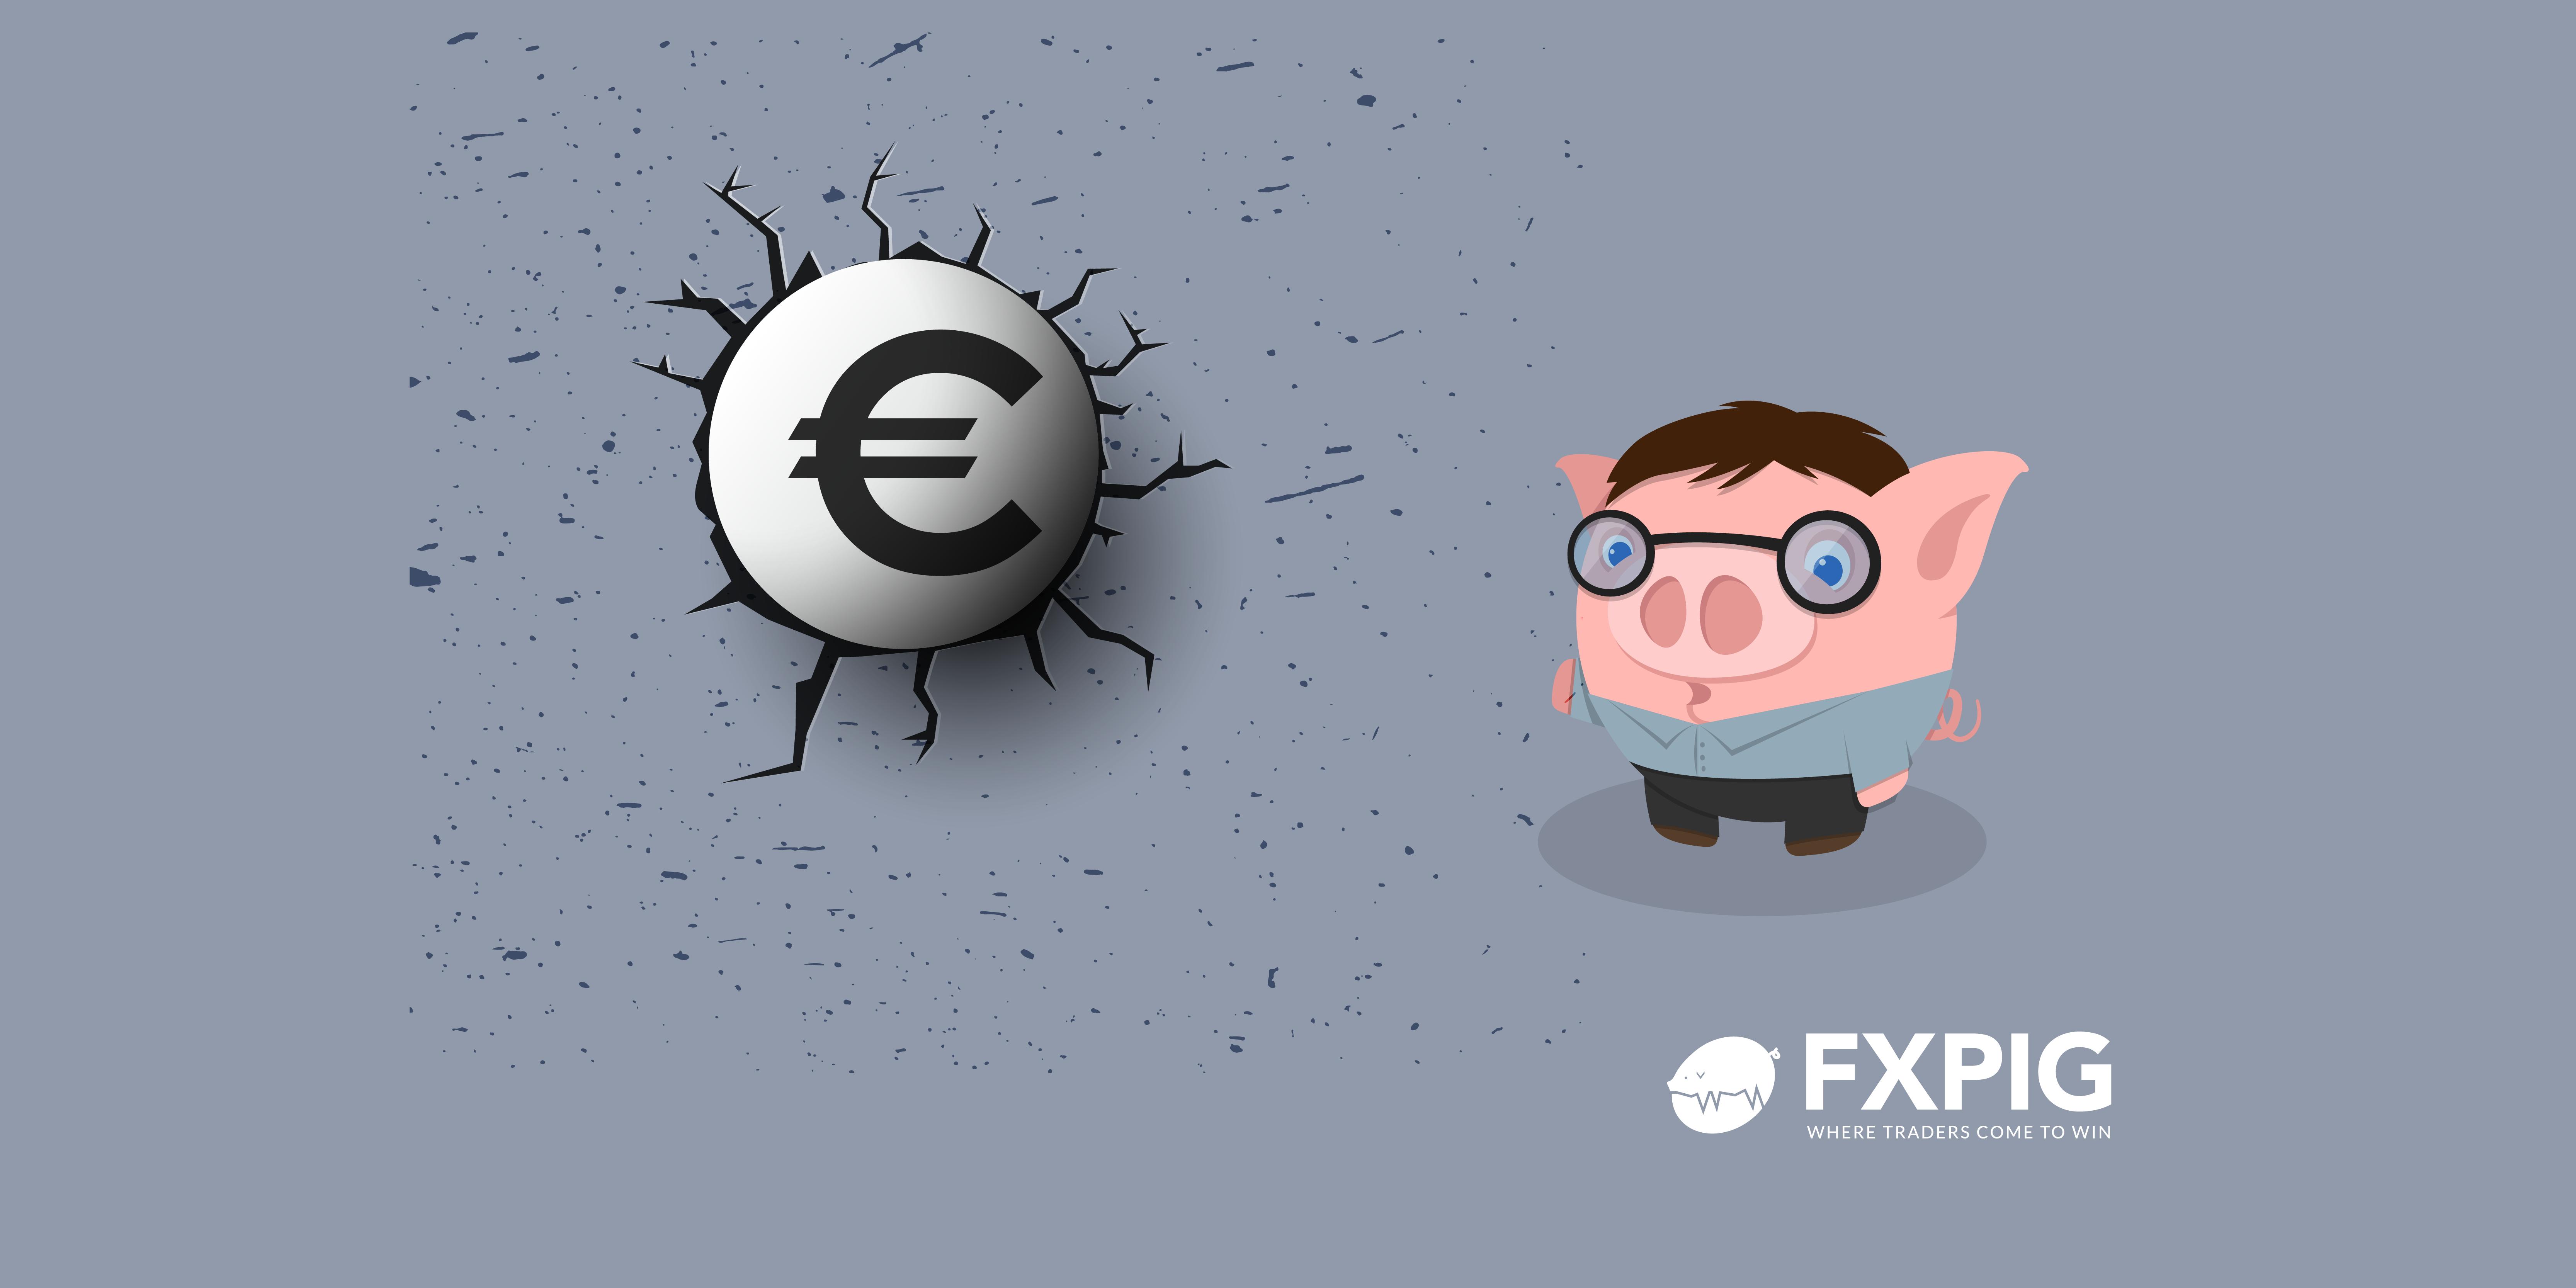 Forex_Trading_Fx_Trader_FXPIG_Tech-analysis_EURUSD_depressed